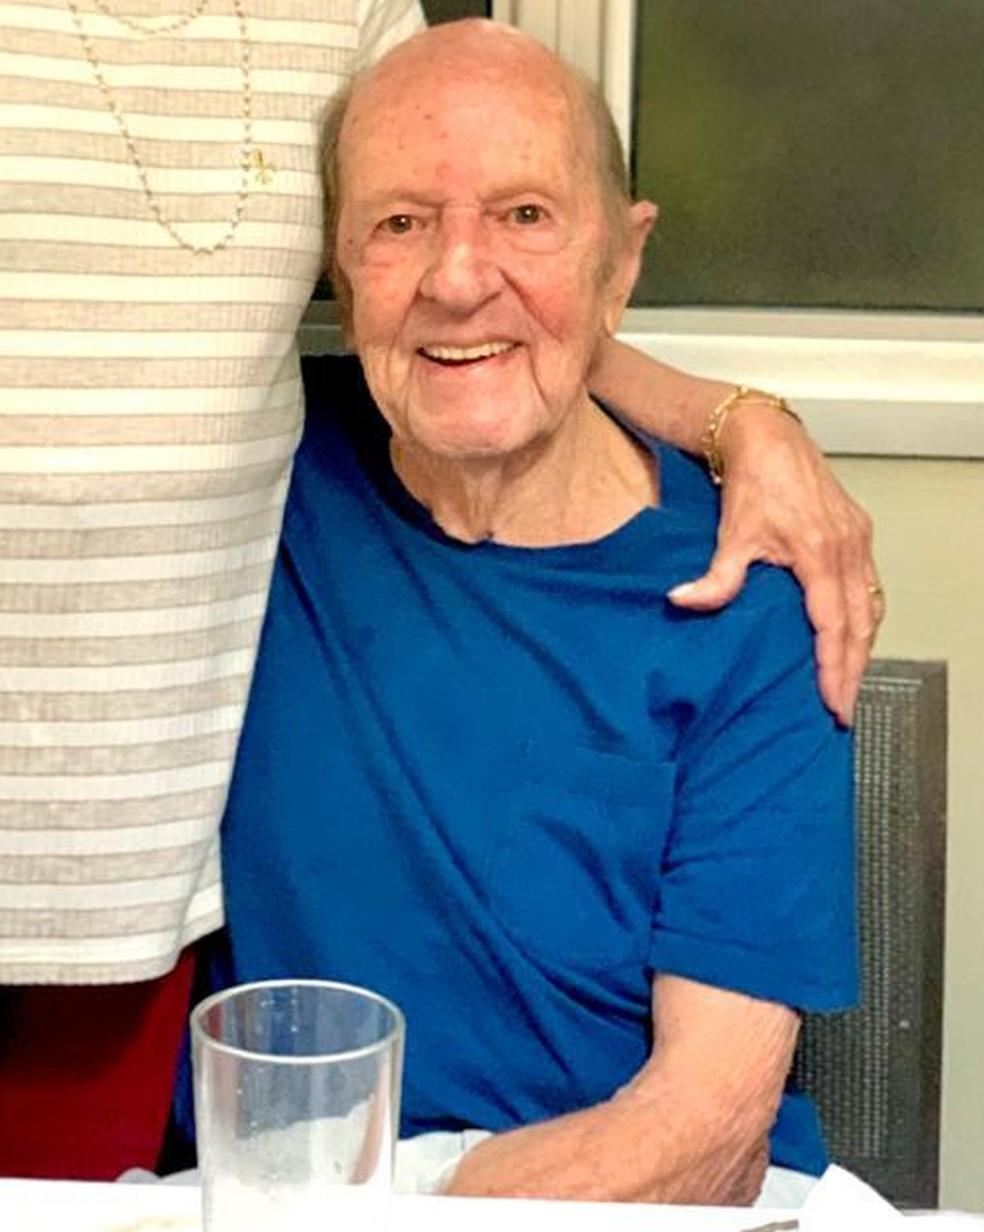 Milton Pires era dono de bar tradicional de BH e tomou Belorizontina — Foto: Foto cedida pela família